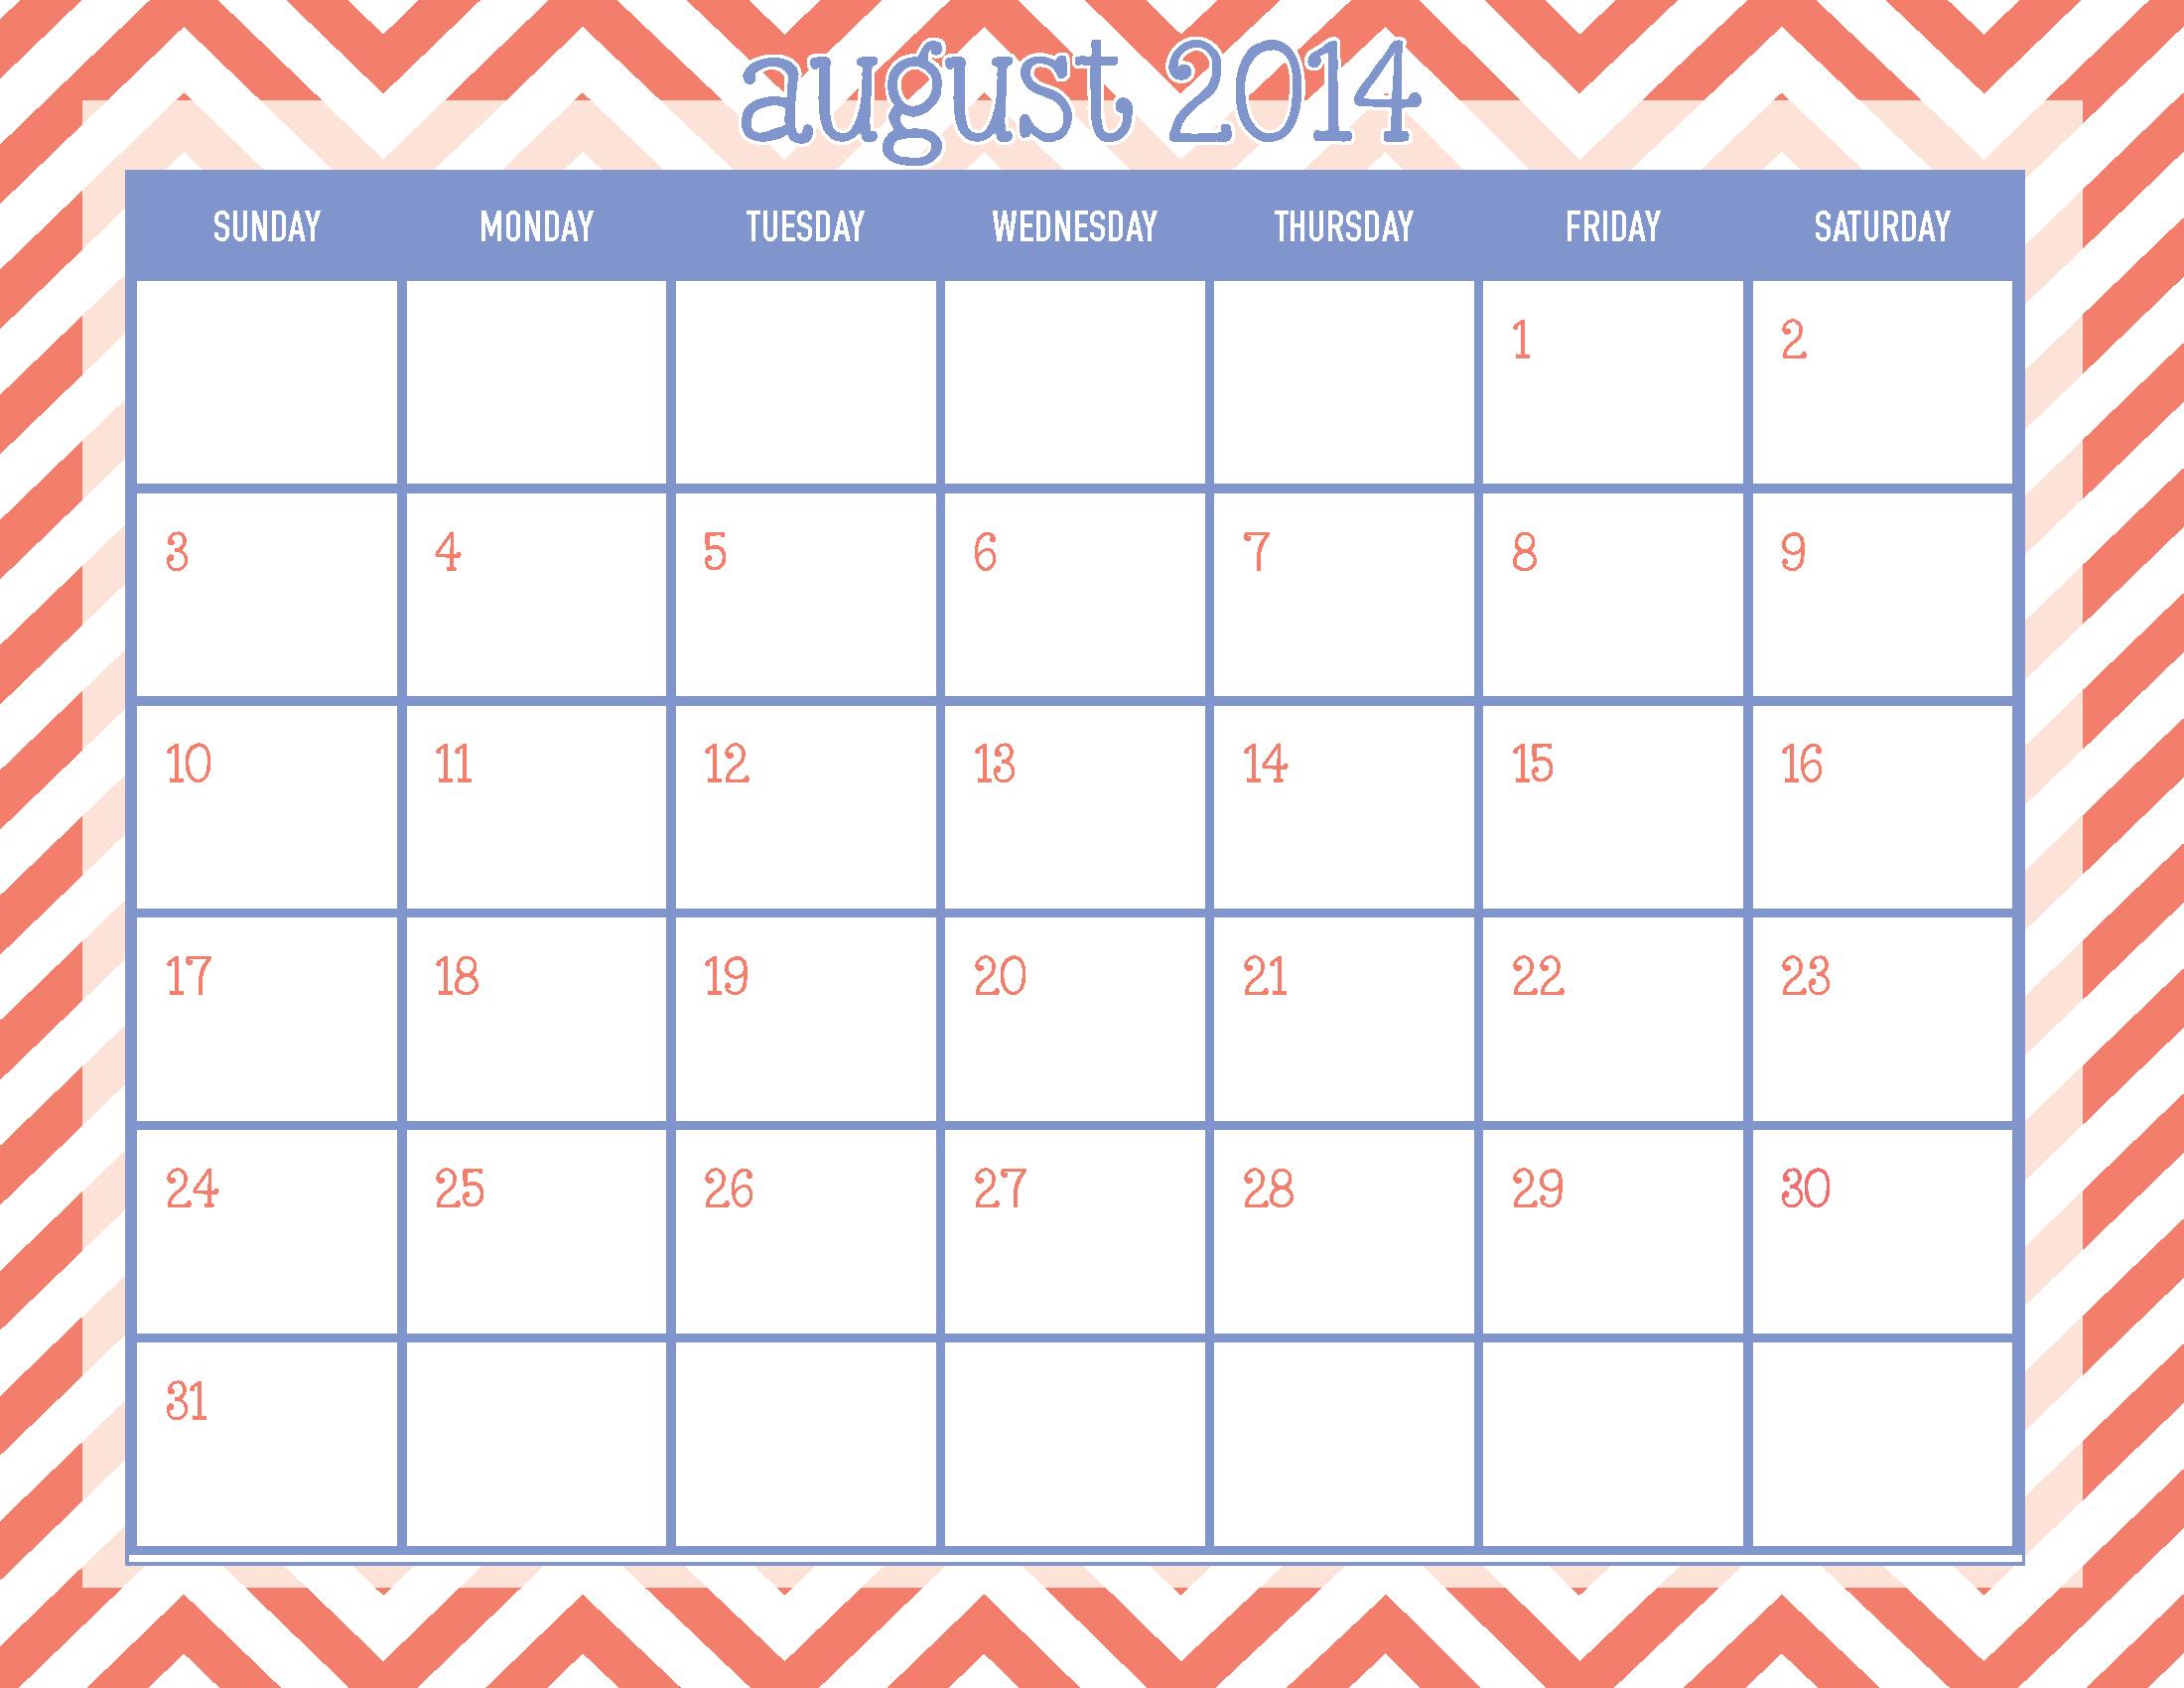 Simple & Savvy Designs | Blog throughout Calendar Ng Manok Panabong